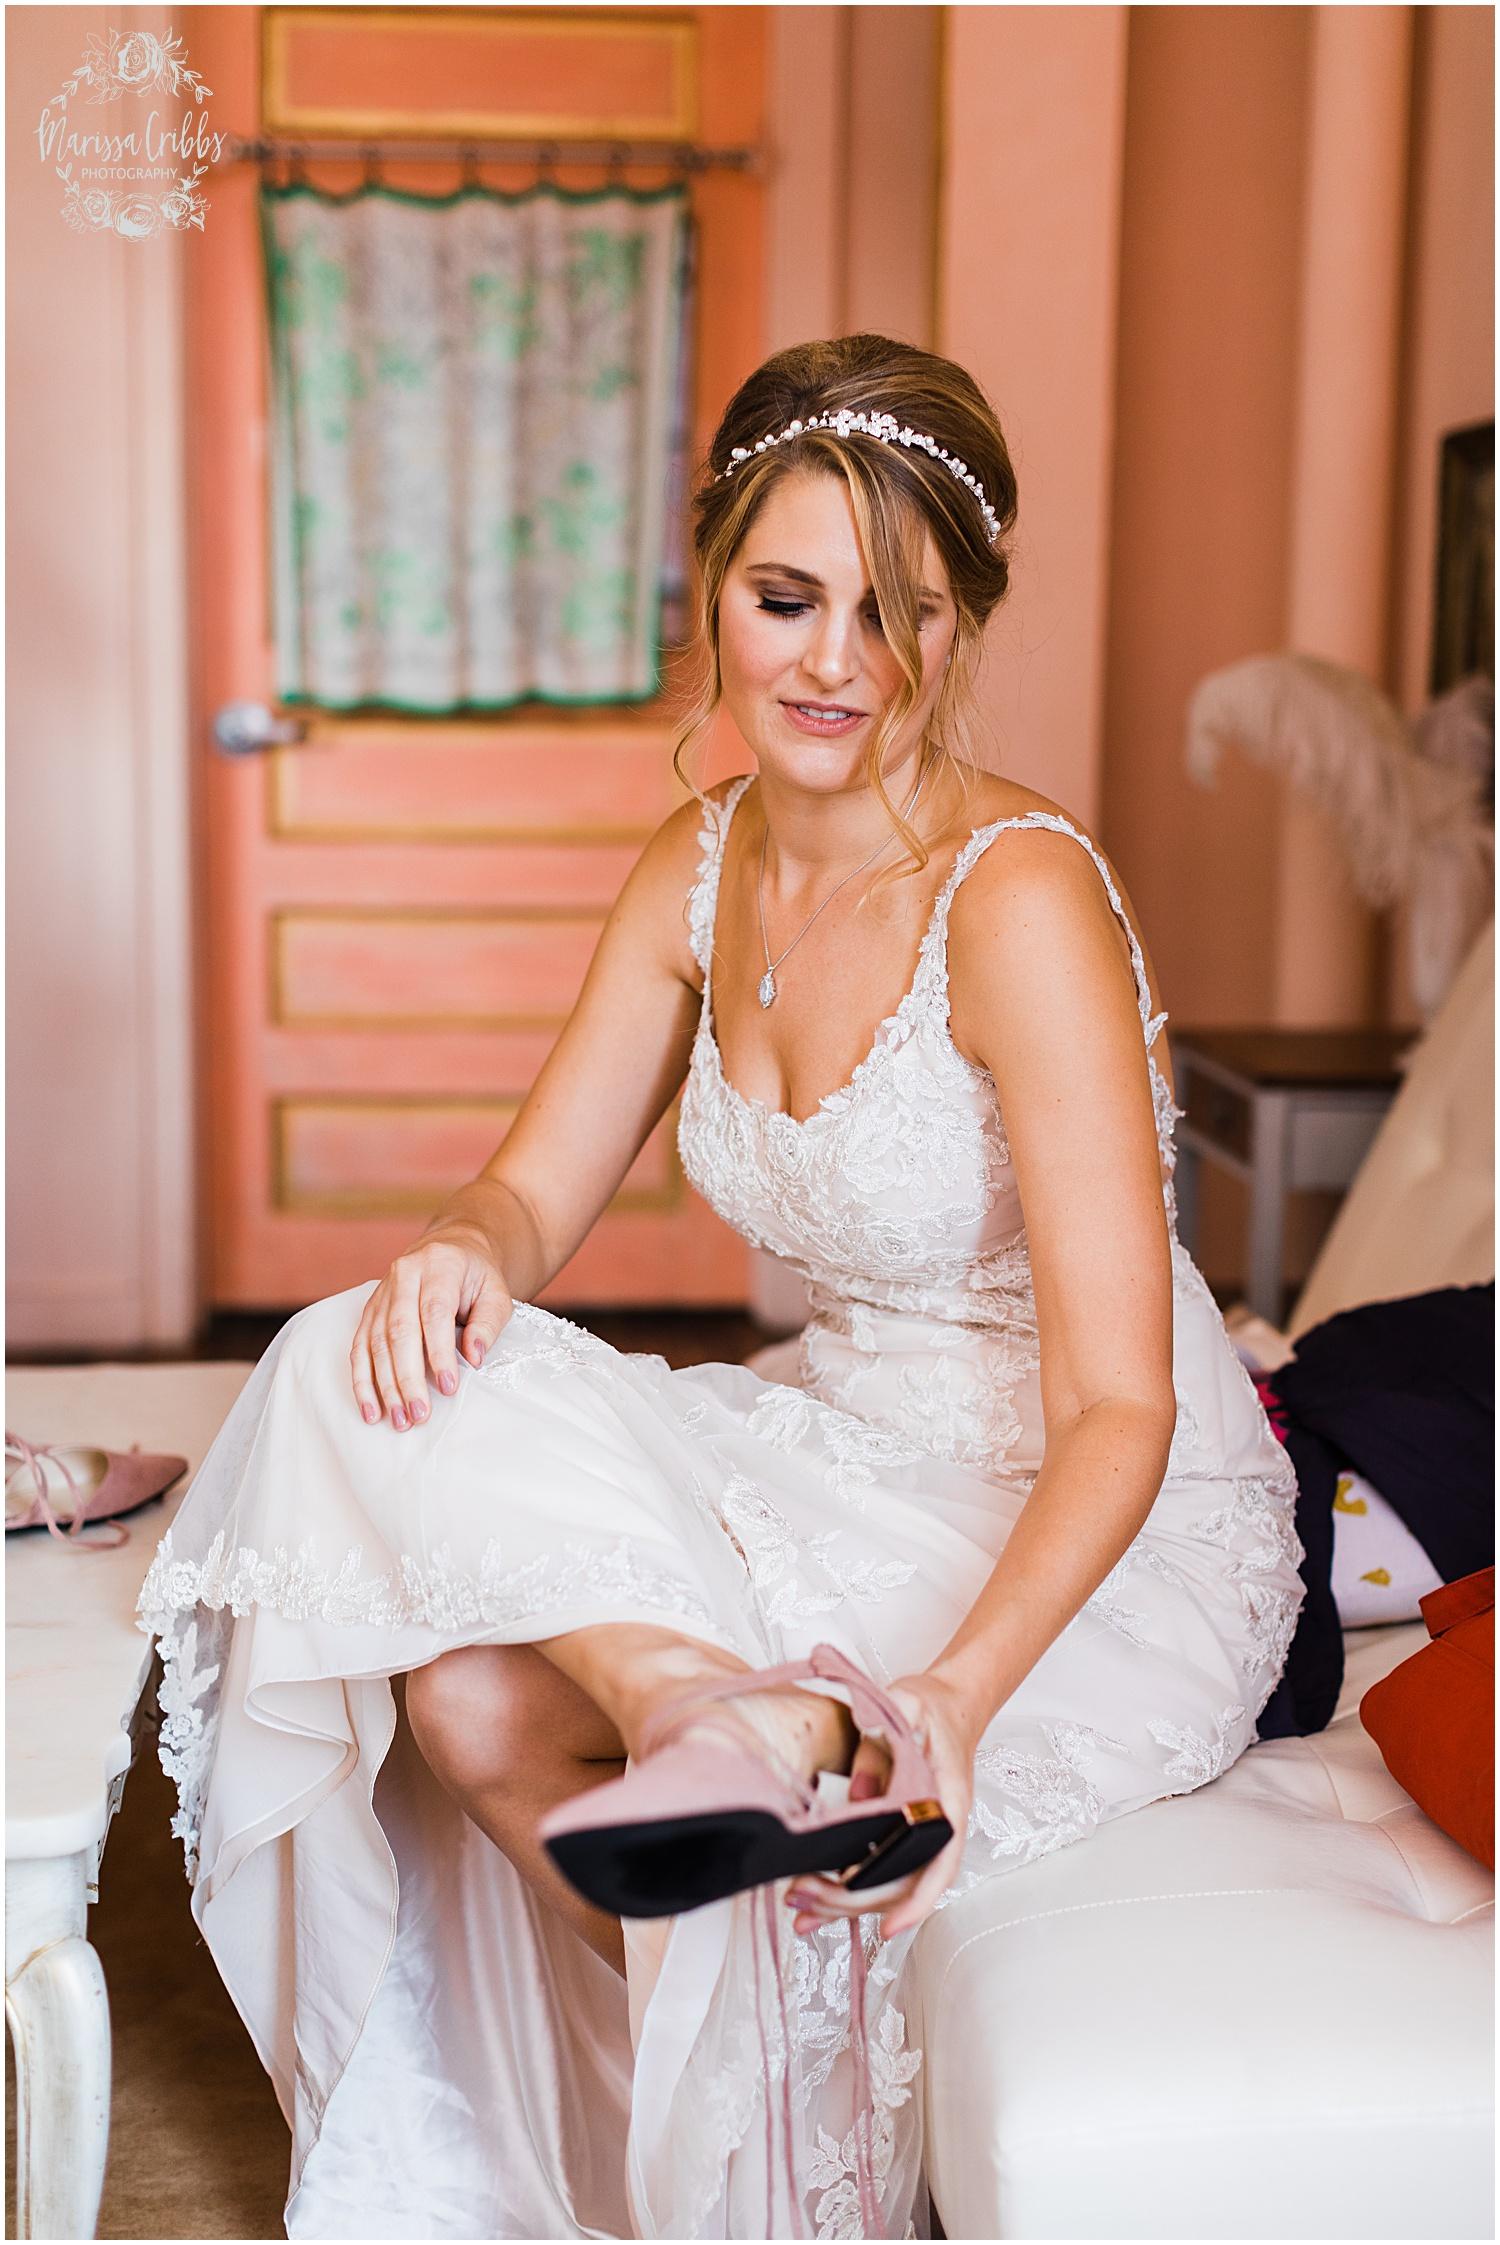 BAUER WEDDING   KELSEA & JUSTIN   MARISSA CRIBBS PHOTOGRAPHY_6499.jpg